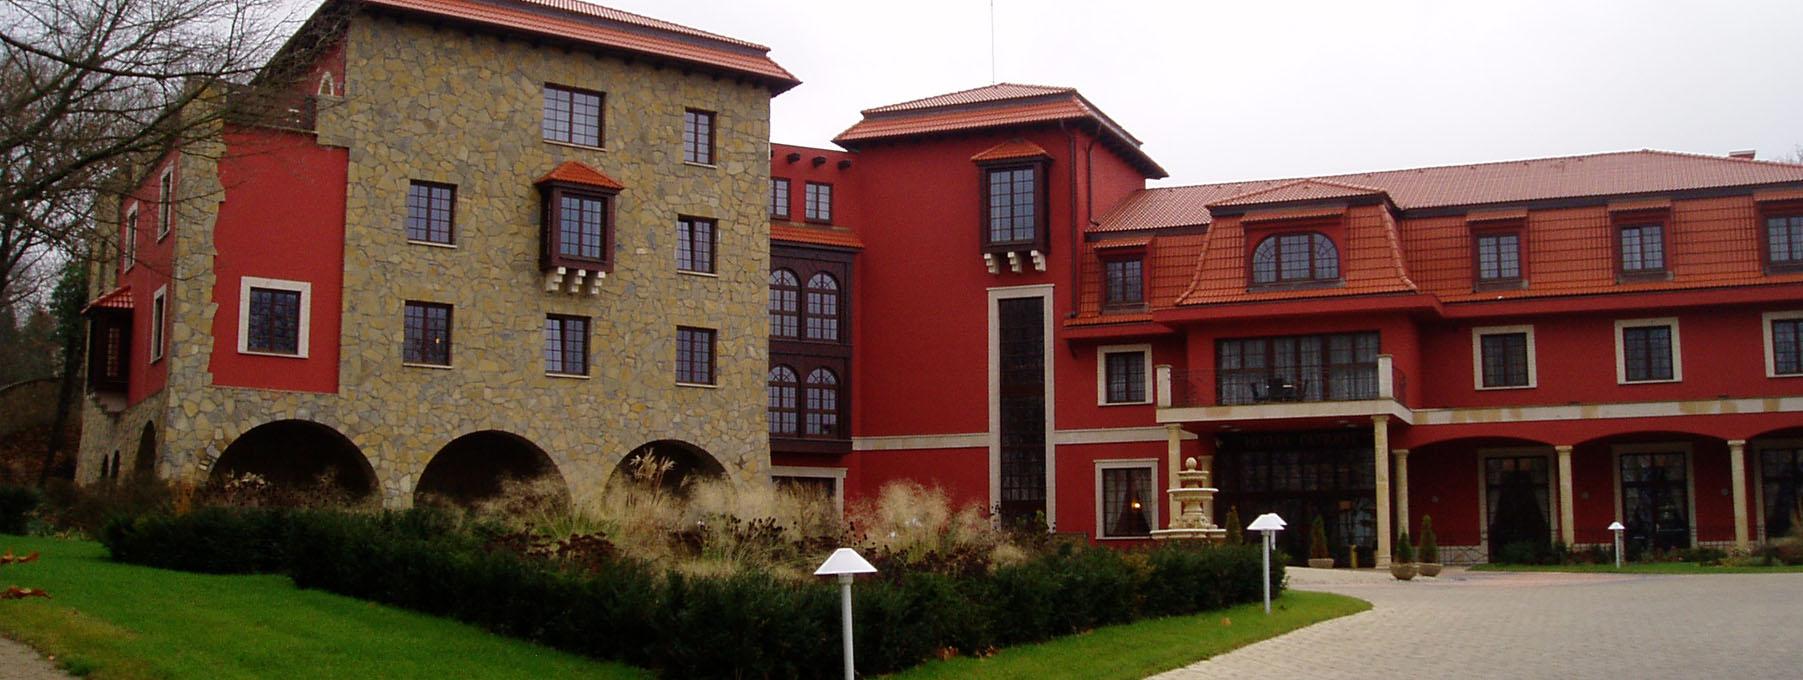 Hotel Sv. Ludmila II Skalica SR